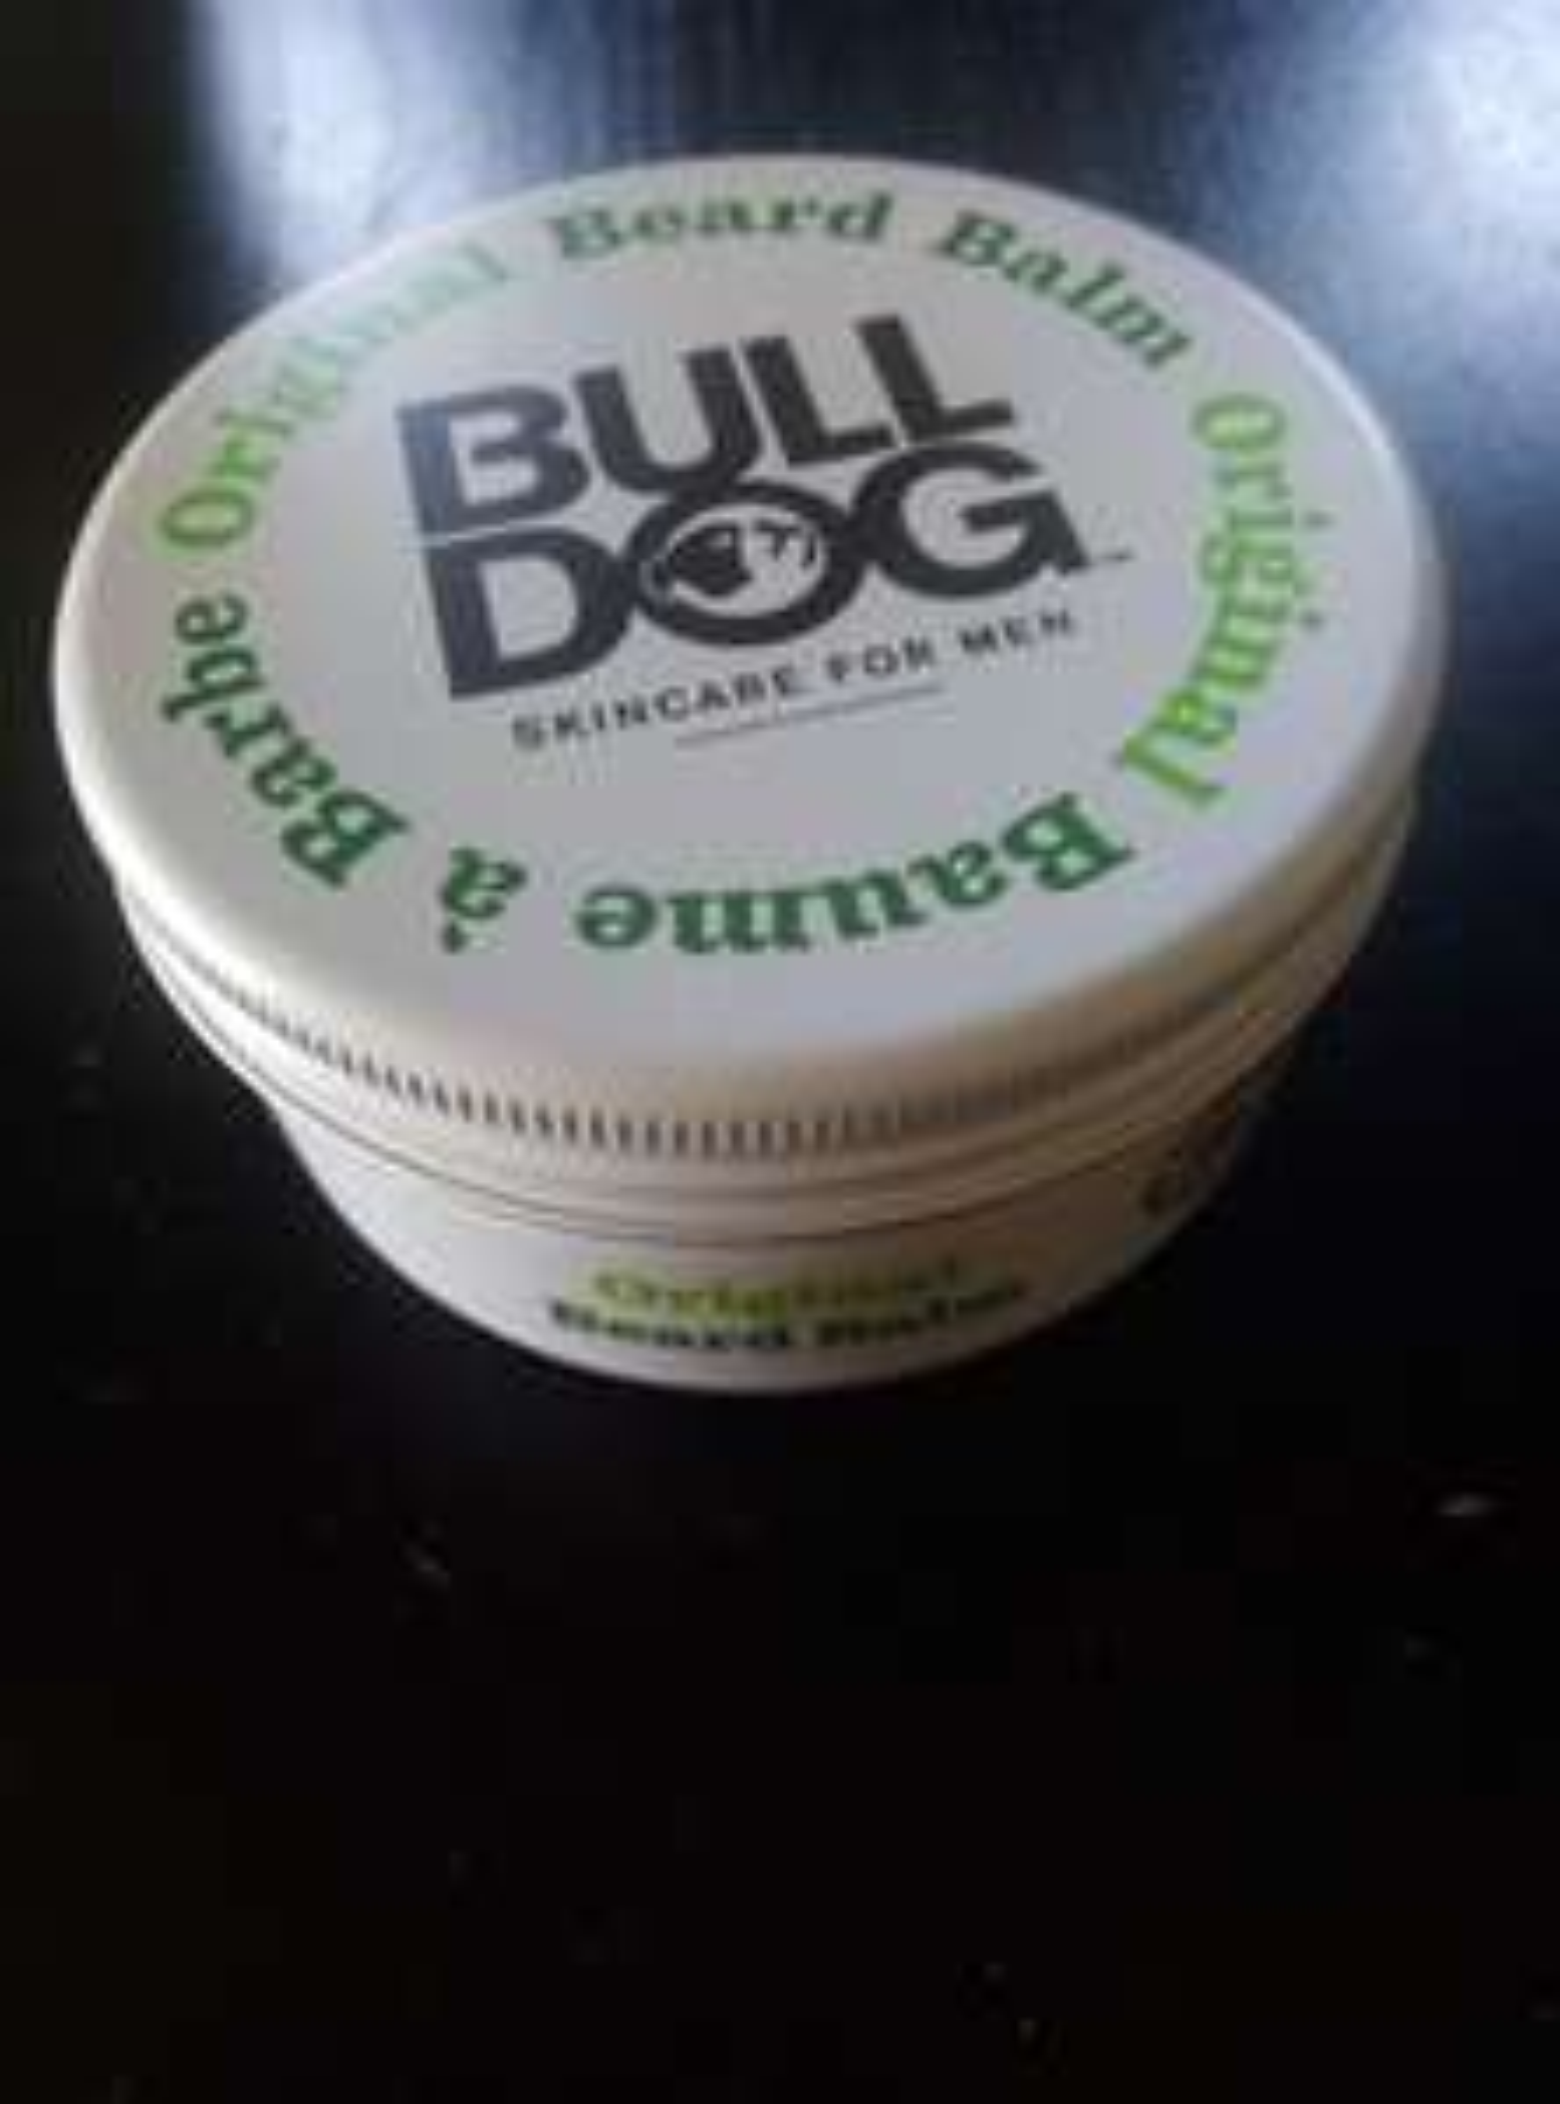 Beaume à barbe Origin Bull Dog Beard Balm - Rosny sous bois (93)